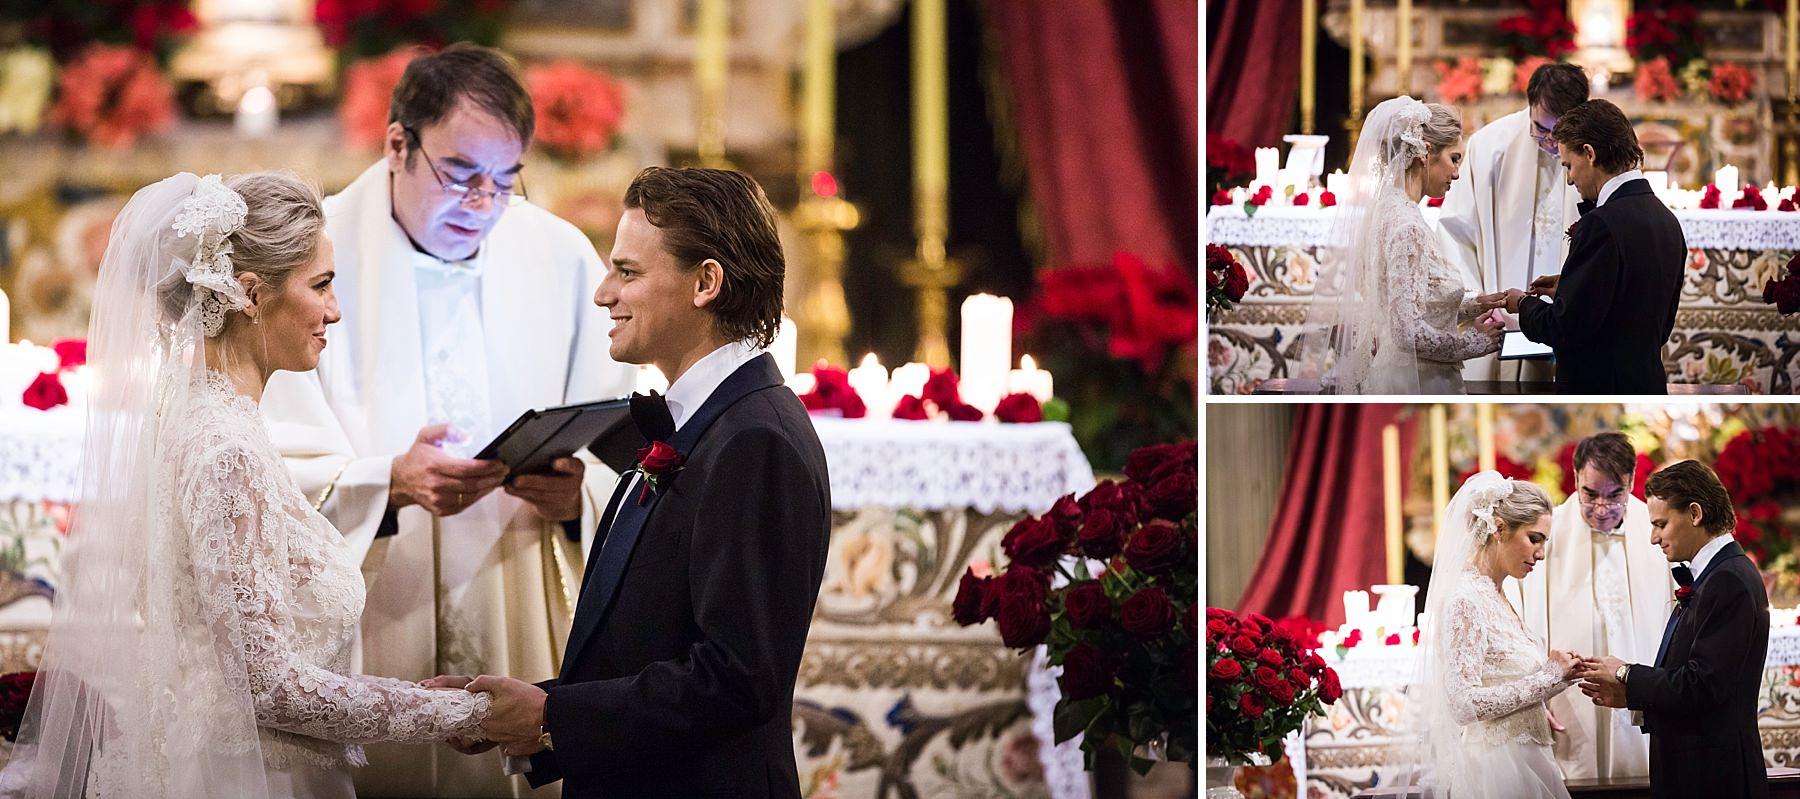 fotografia di matrimonio a Firenze